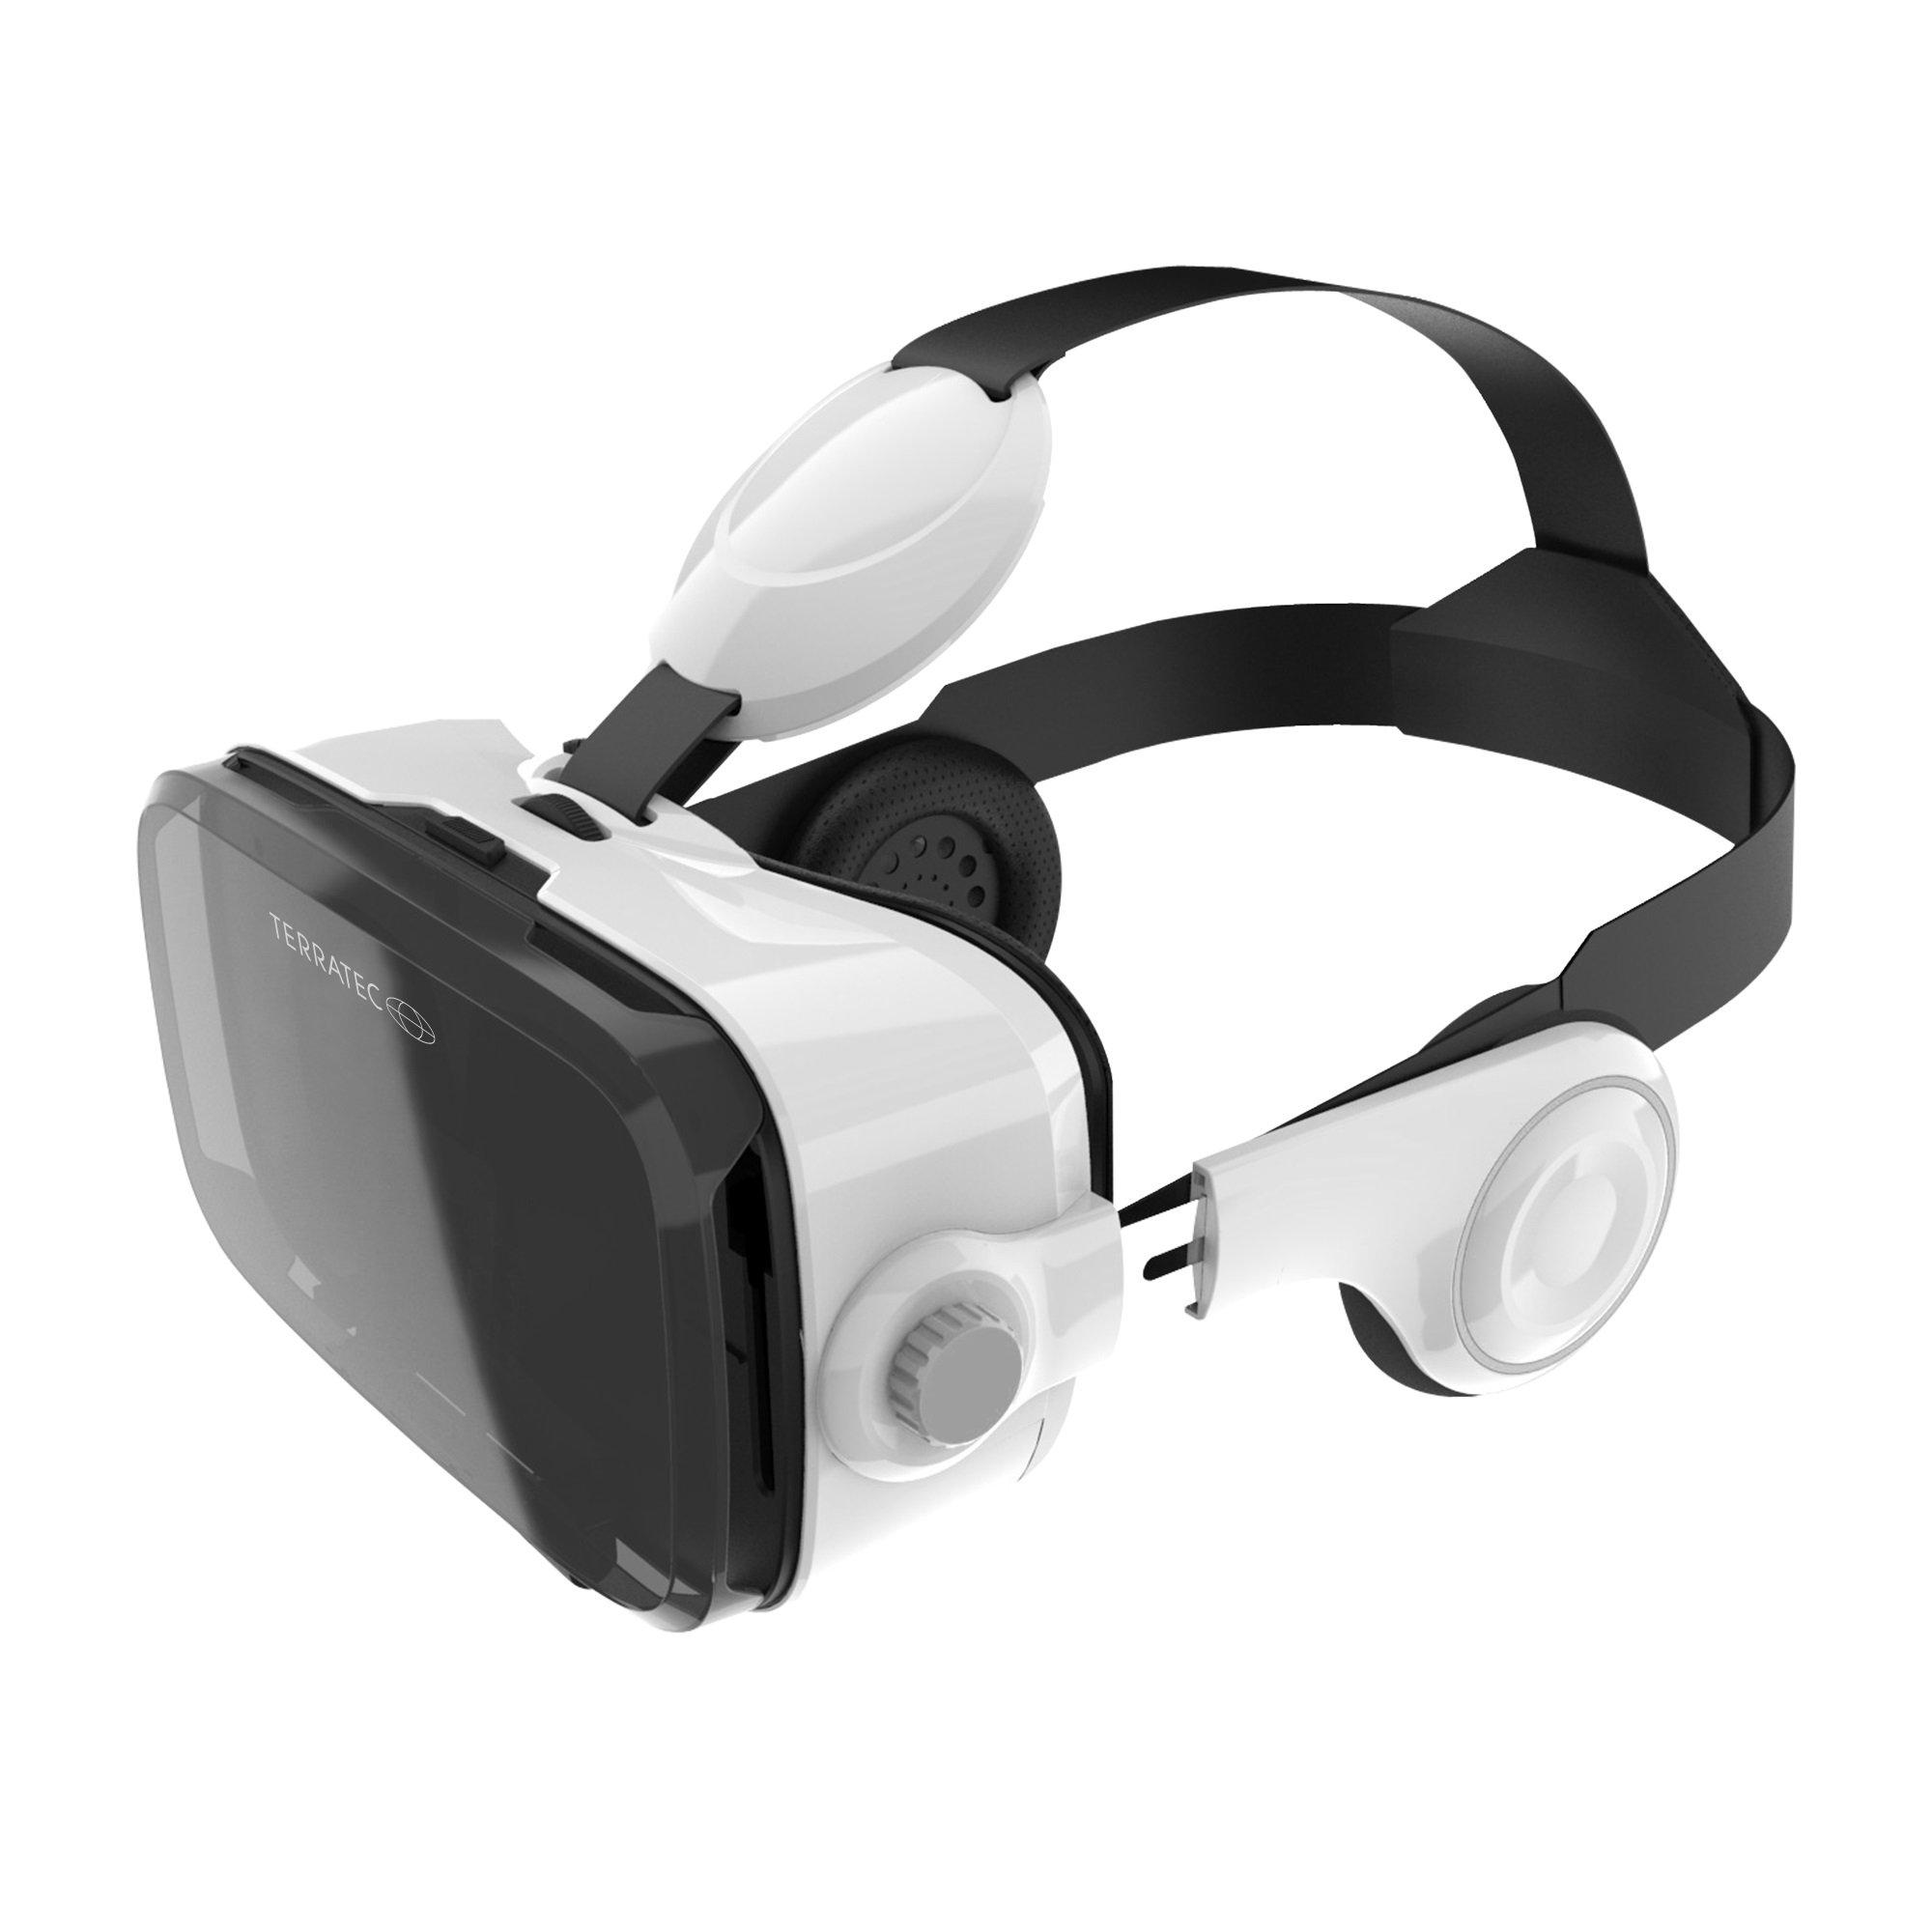 Terratec 218515 VR de 2 Audio, Virtual Reality 3D Gafas para ...